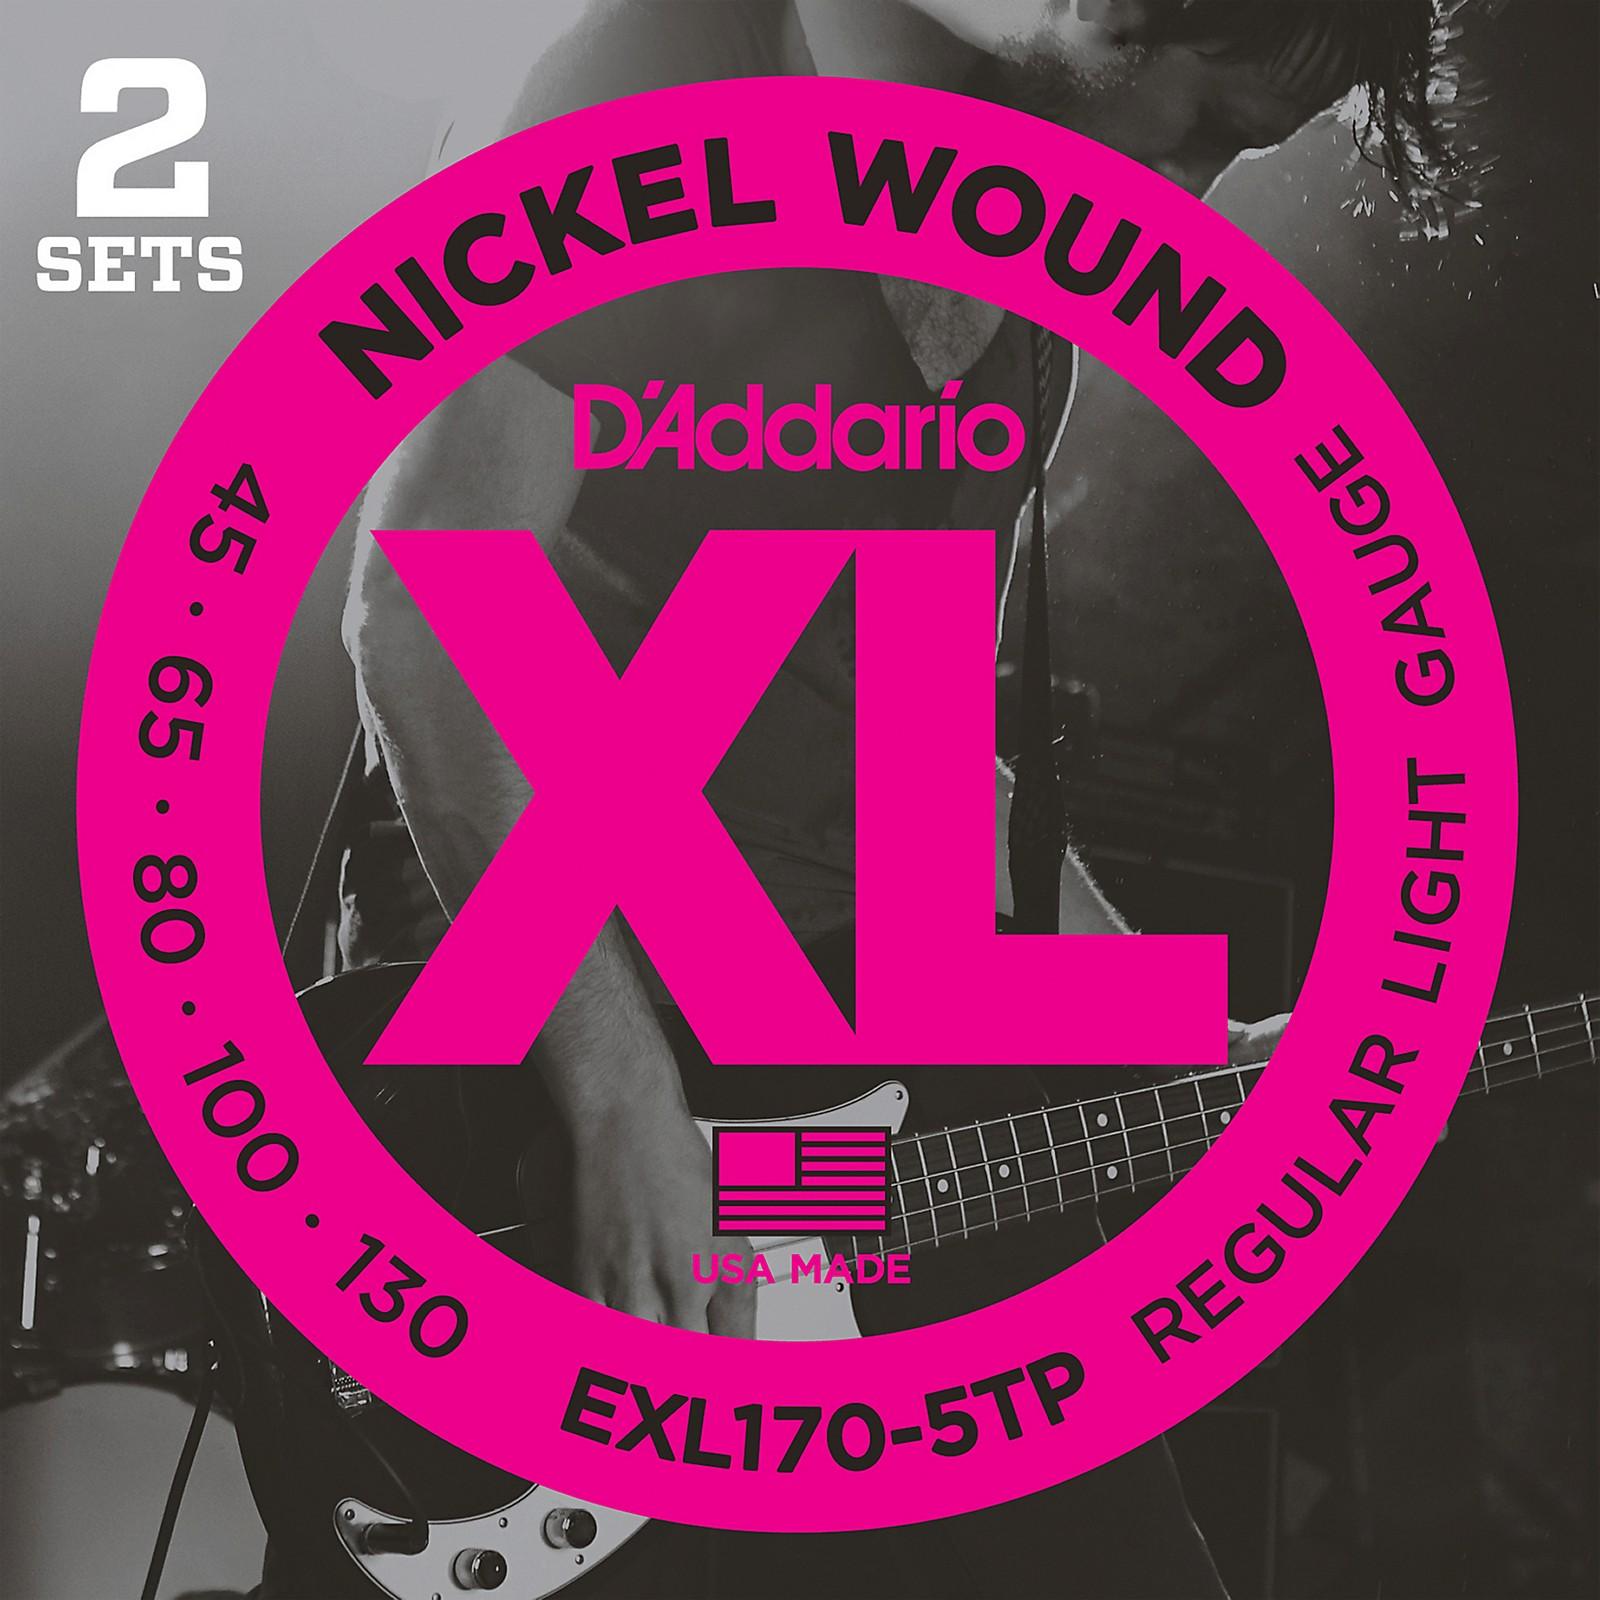 D'Addario EXL170-5TP 5-String Bass Guitar Strings (2 Sets)